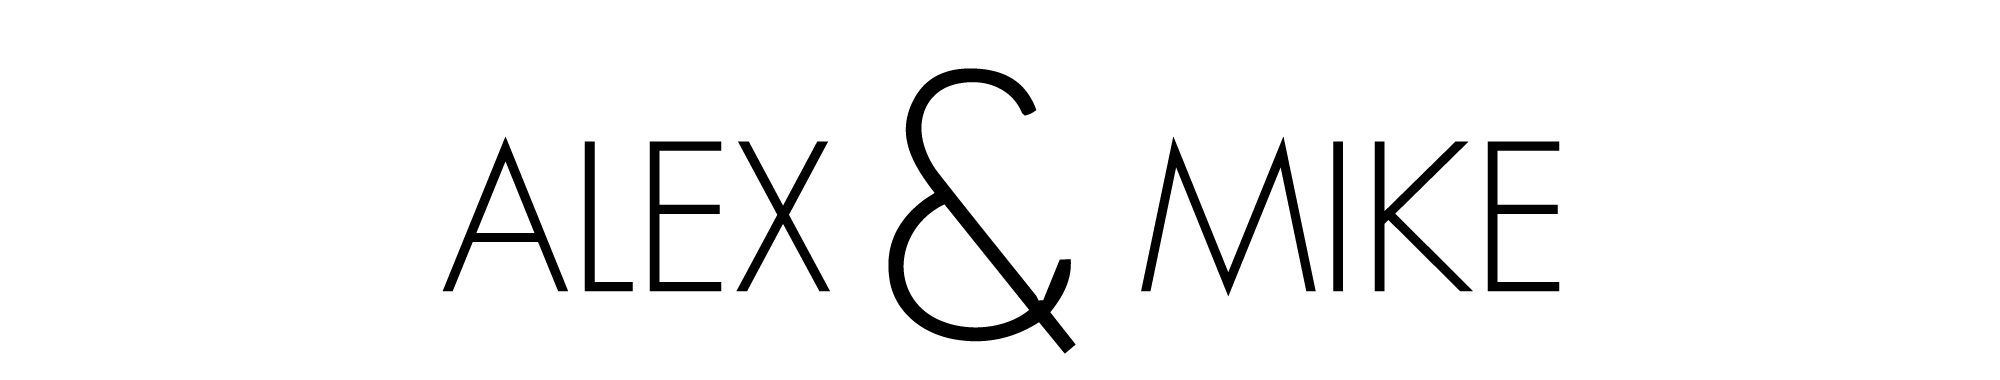 ALEX & MIKE